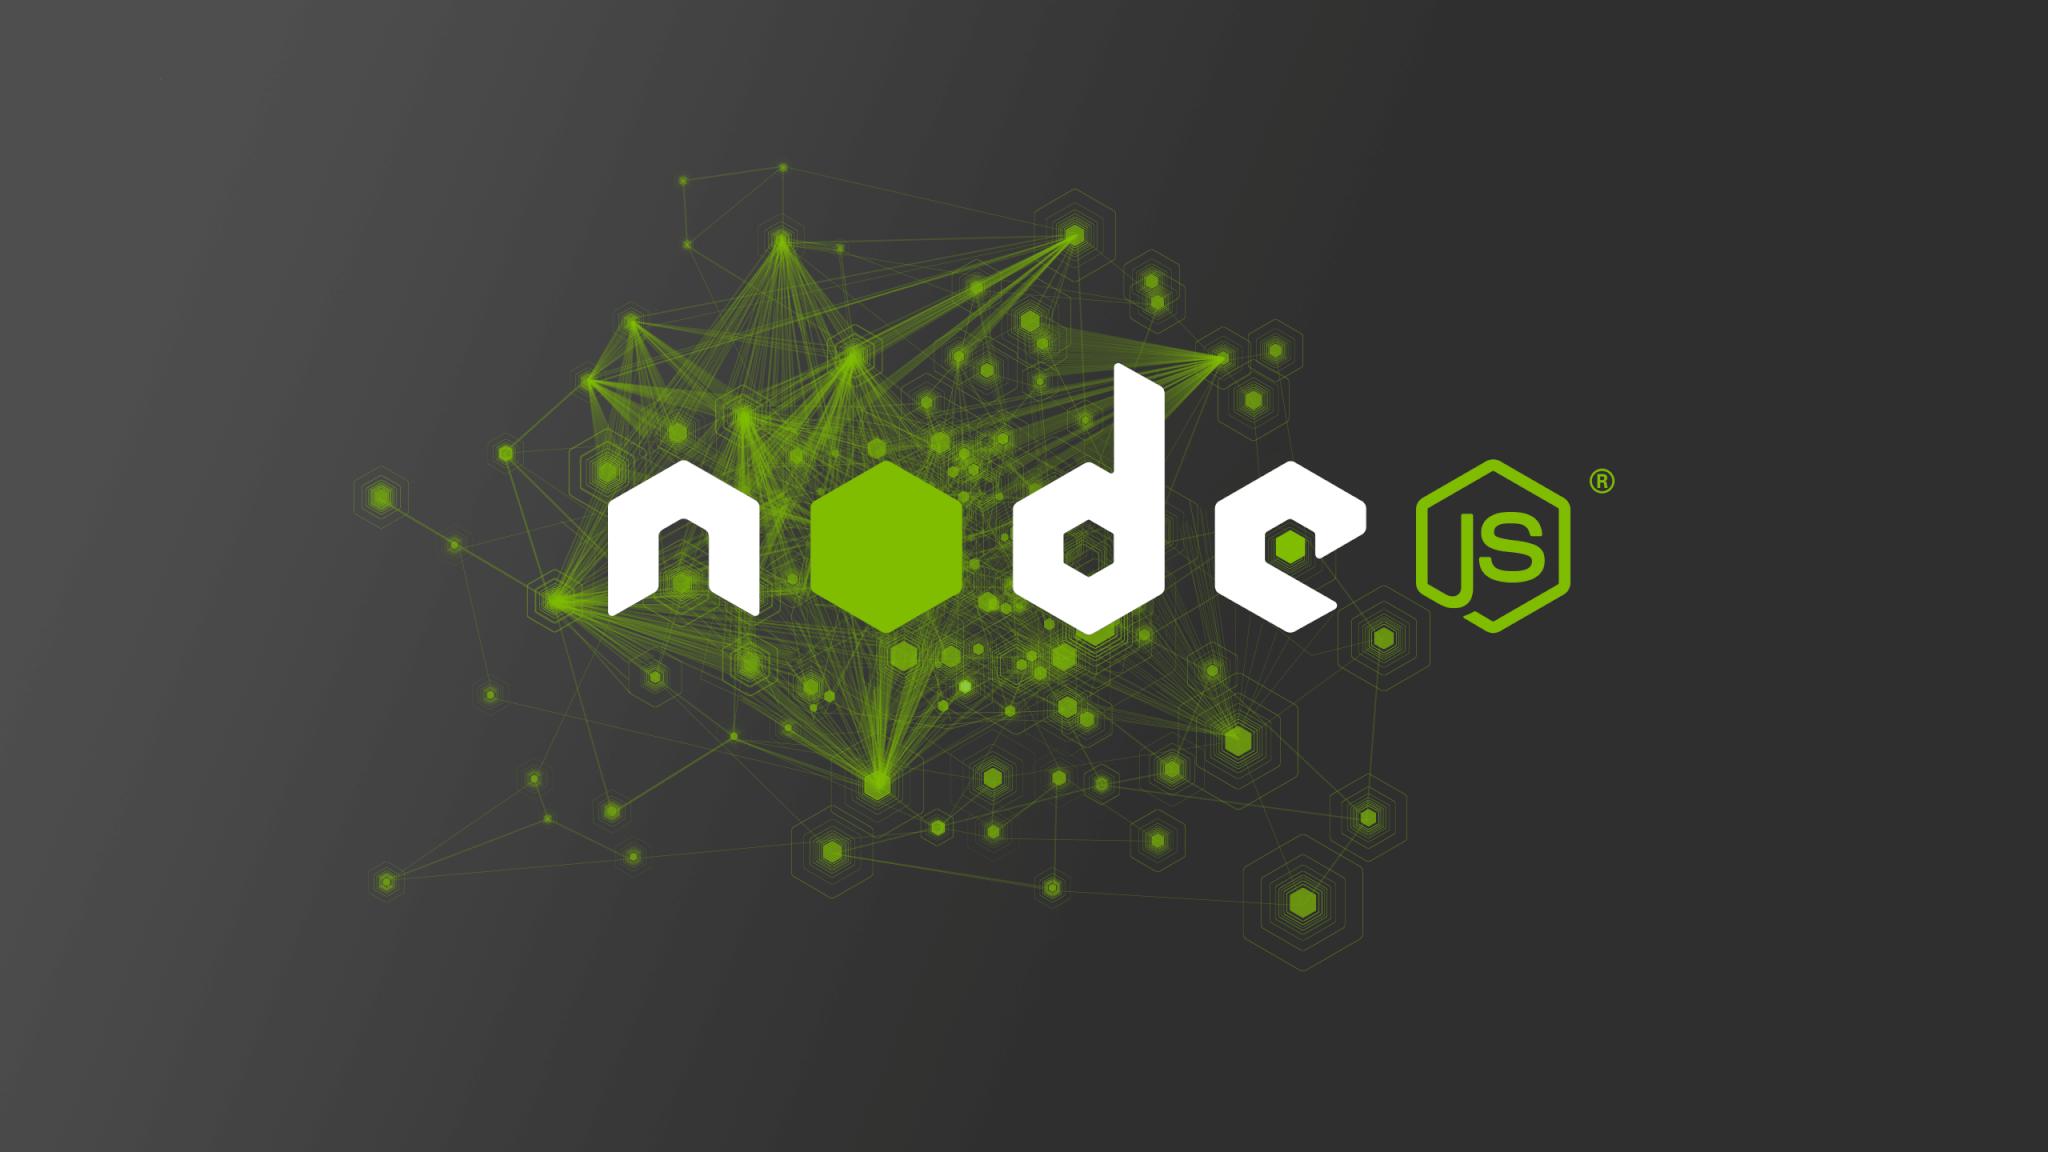 nodejs-2560x1440